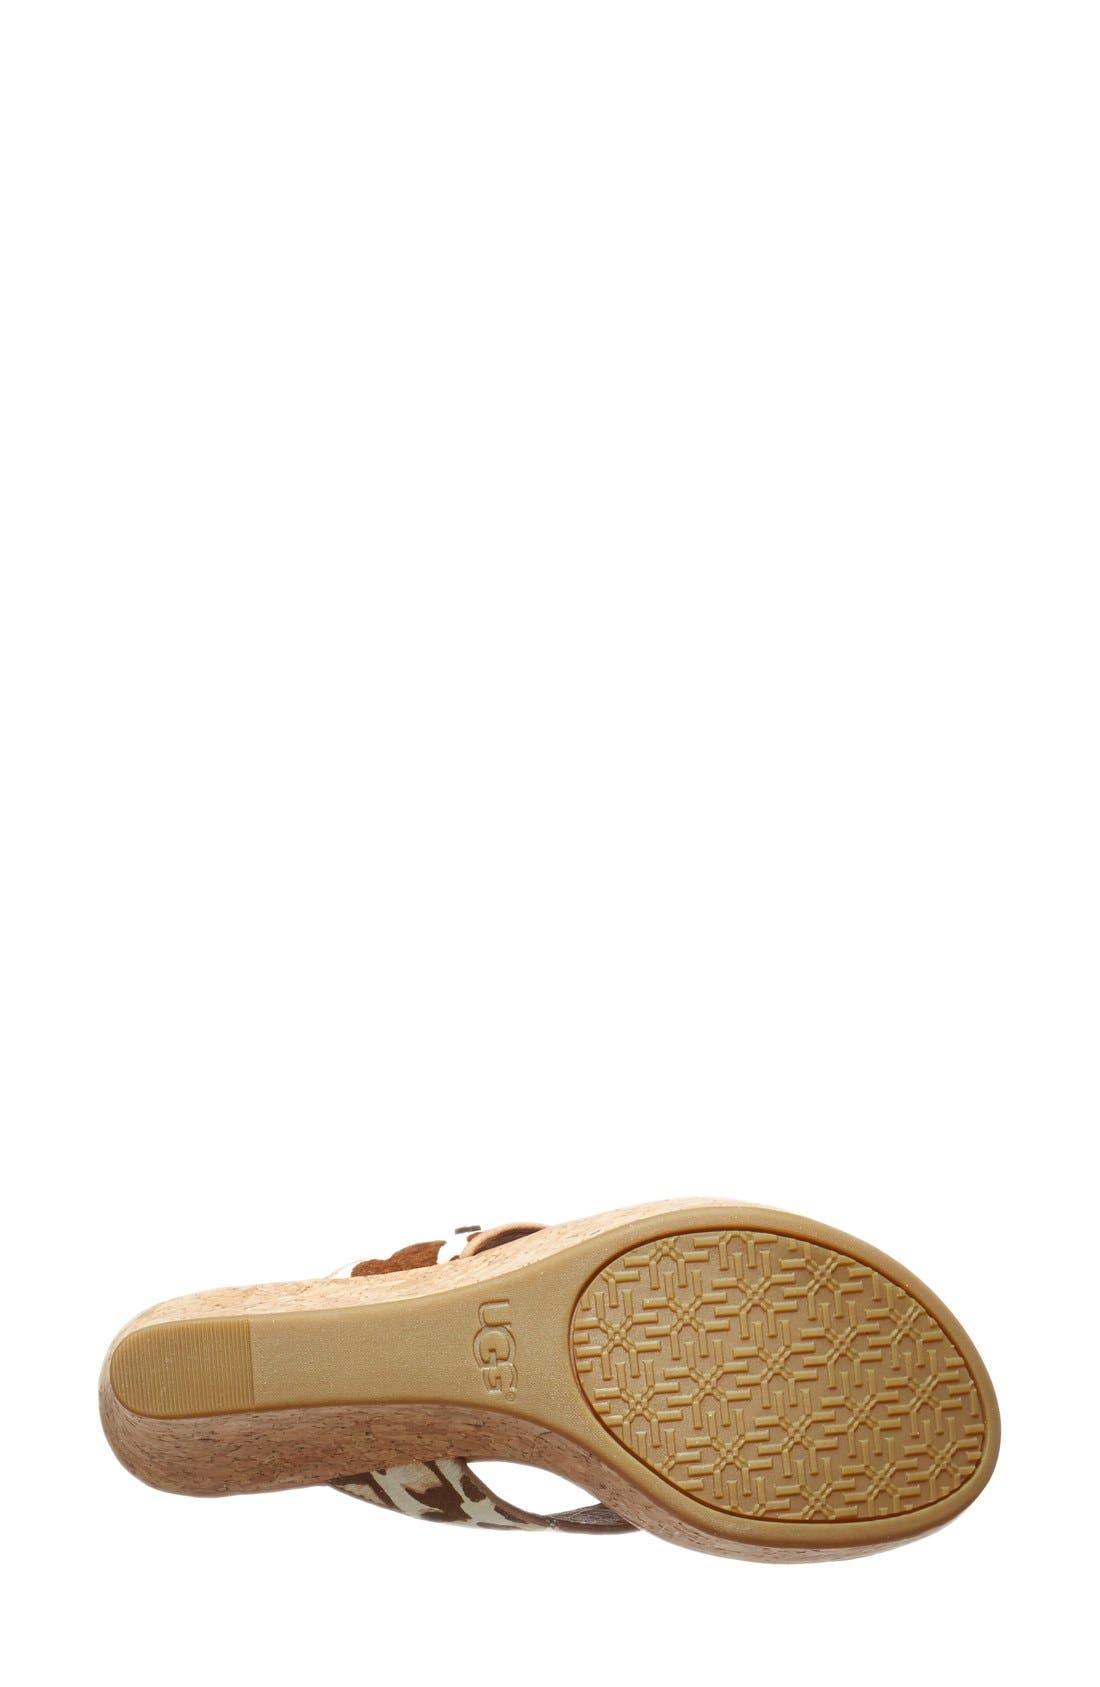 Alternate Image 4  - UGG Australia 'Natassia' Calf Hair Wedge Sandal (Women)